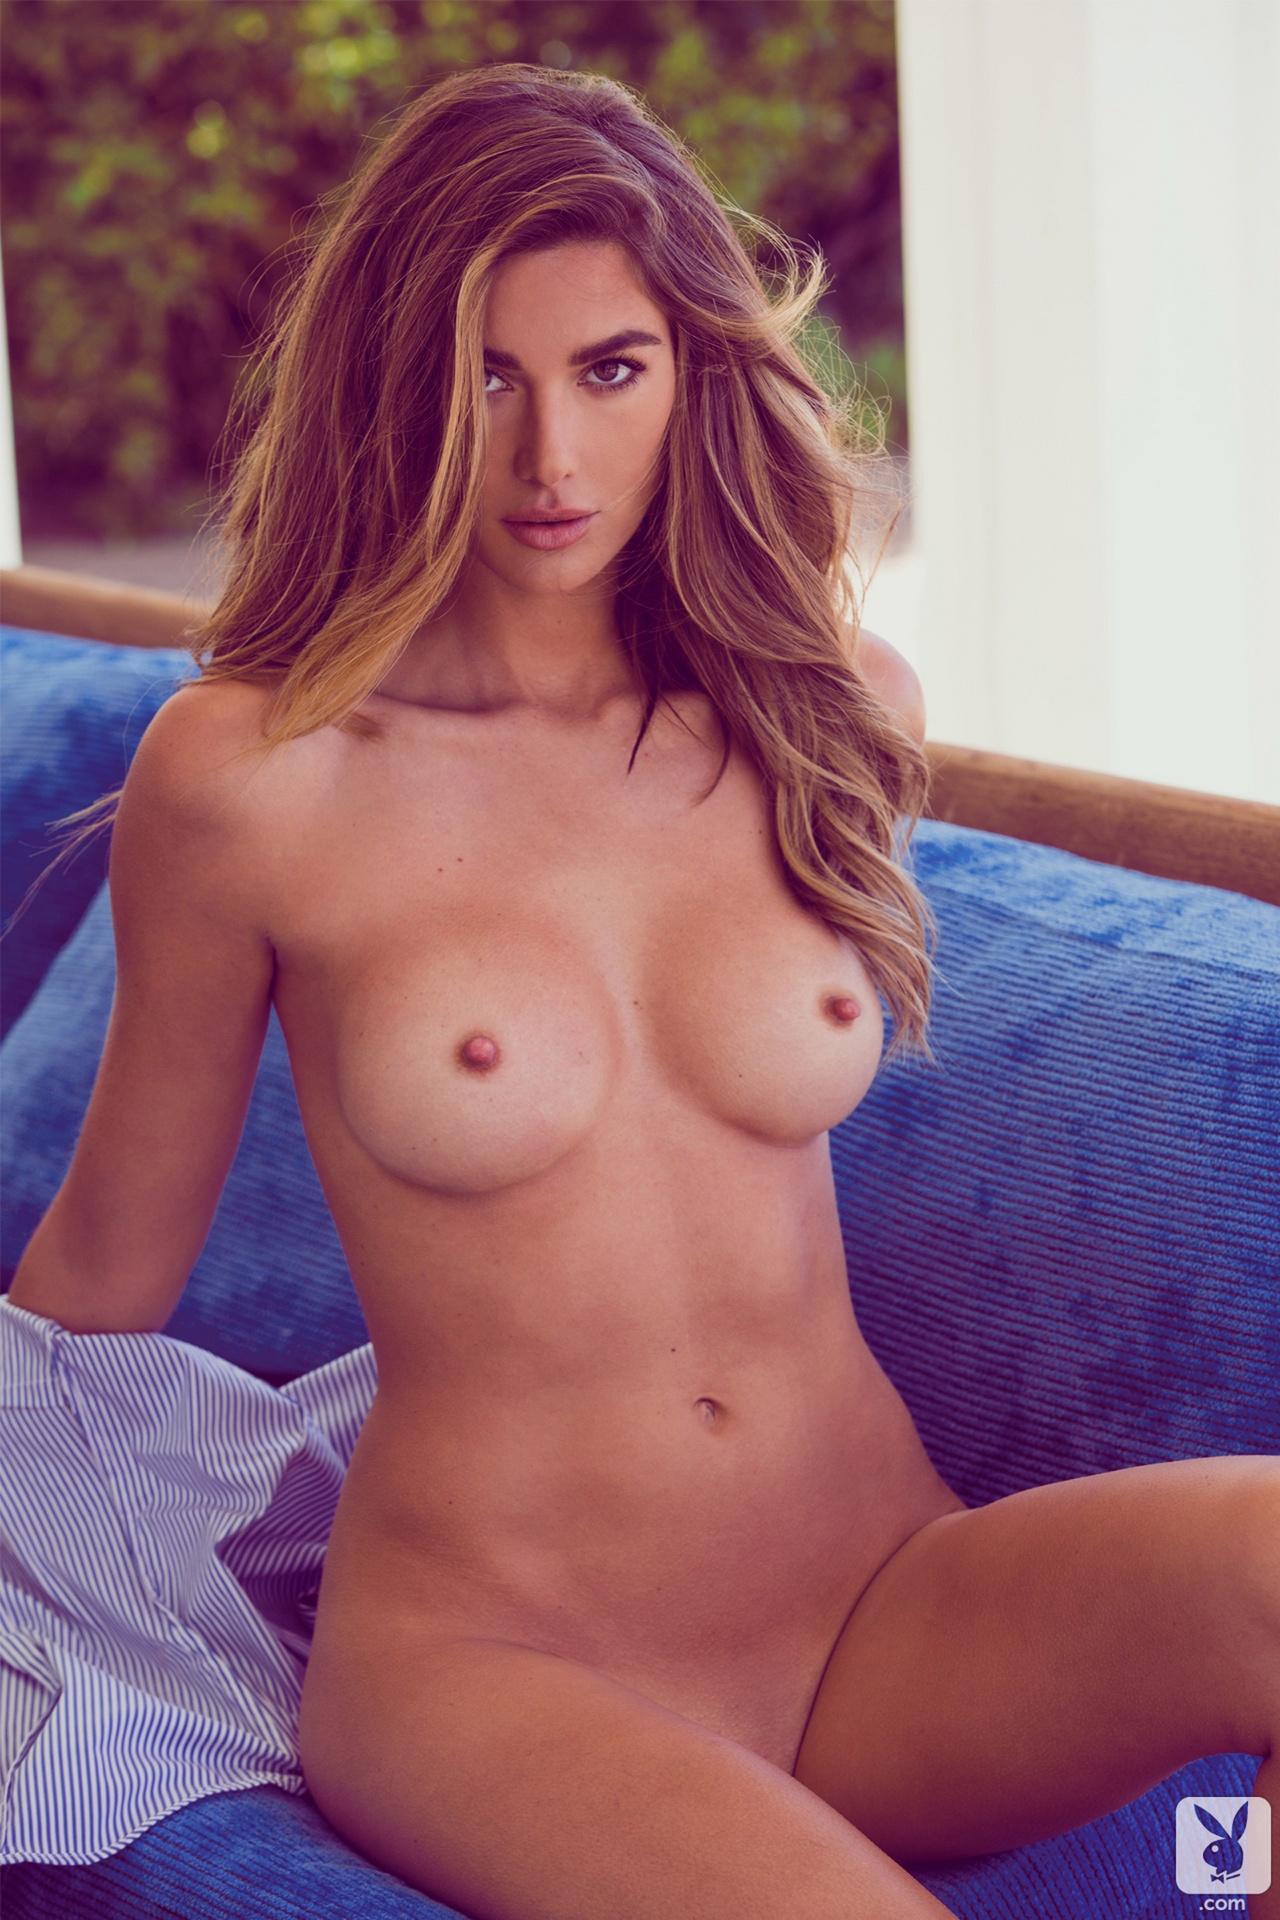 Teens sex nude